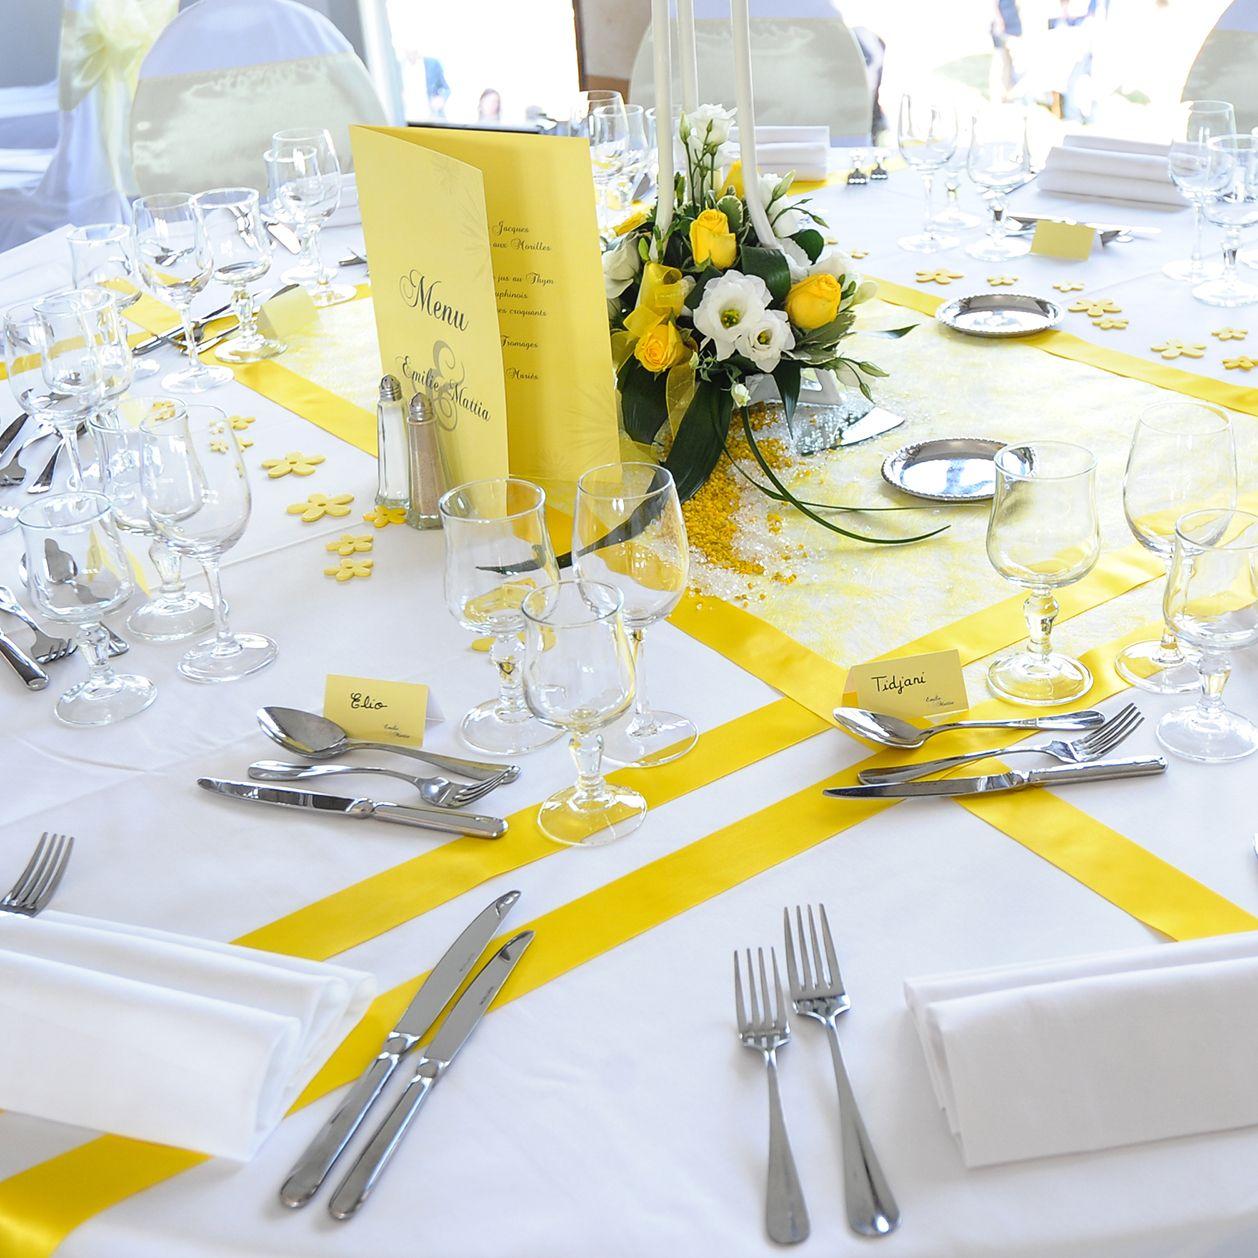 decoration mariage jaune et blanc